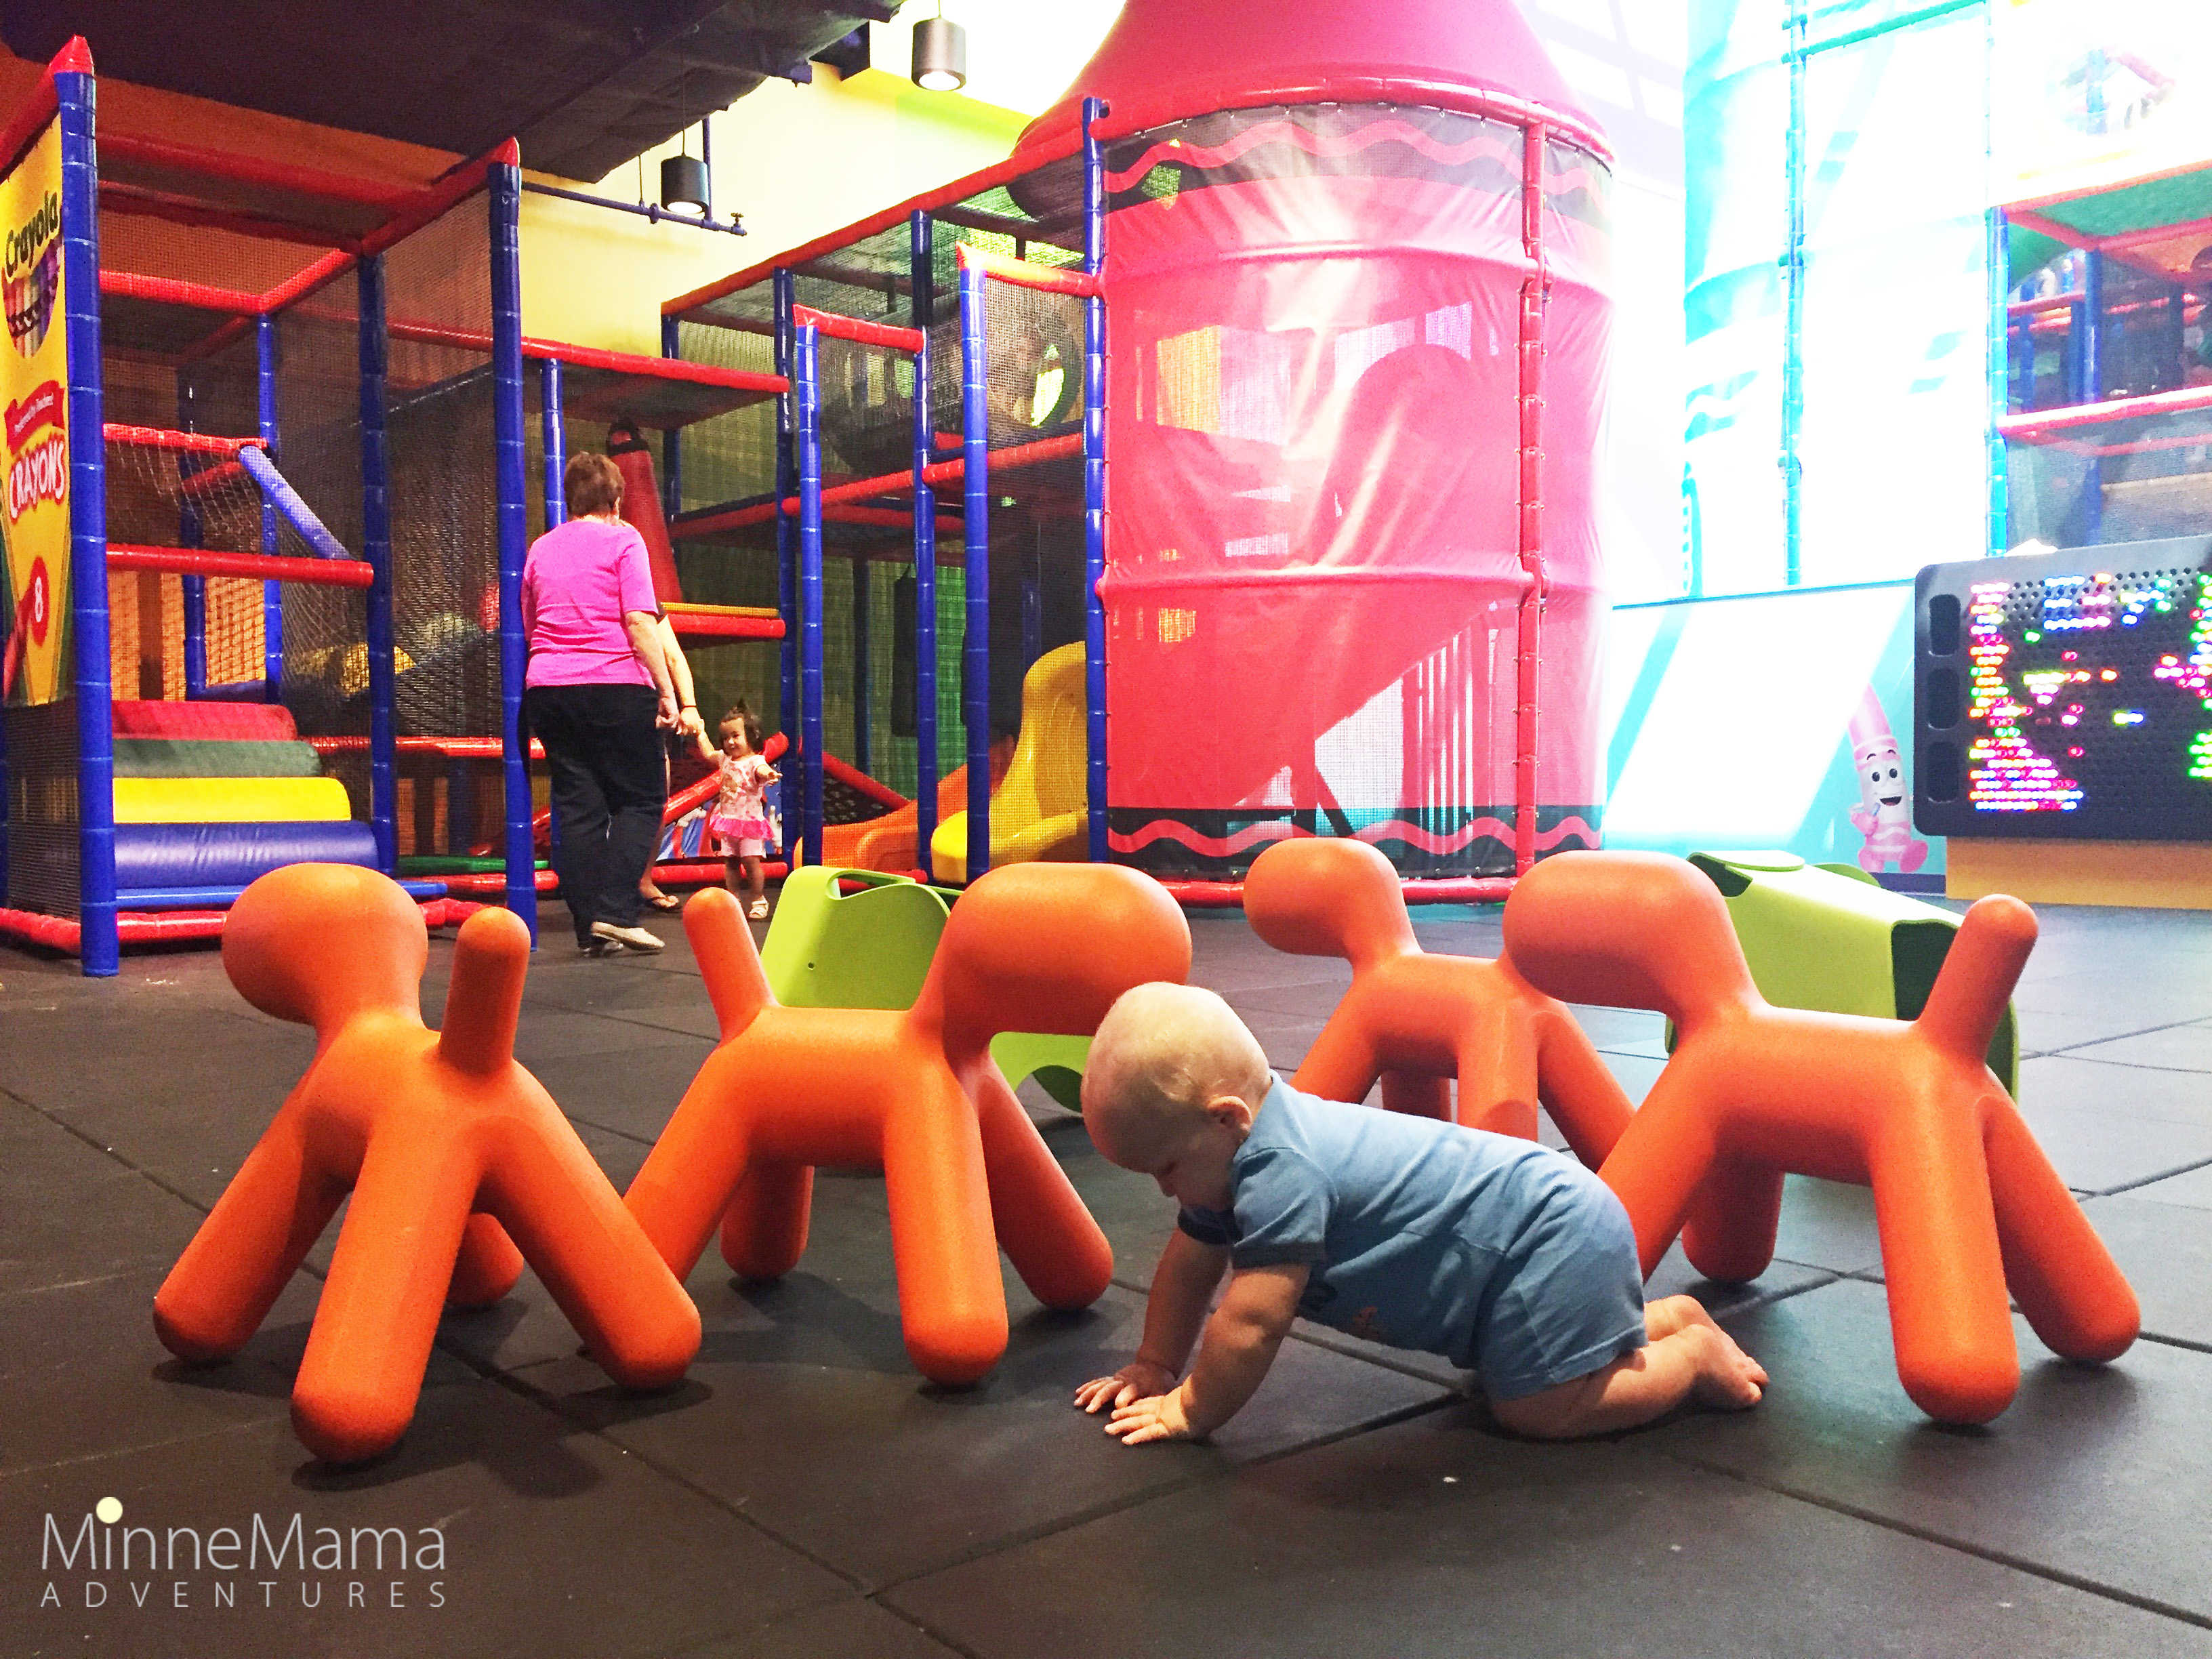 Crayola Experience Mall of America Review - MinneMama Adventures